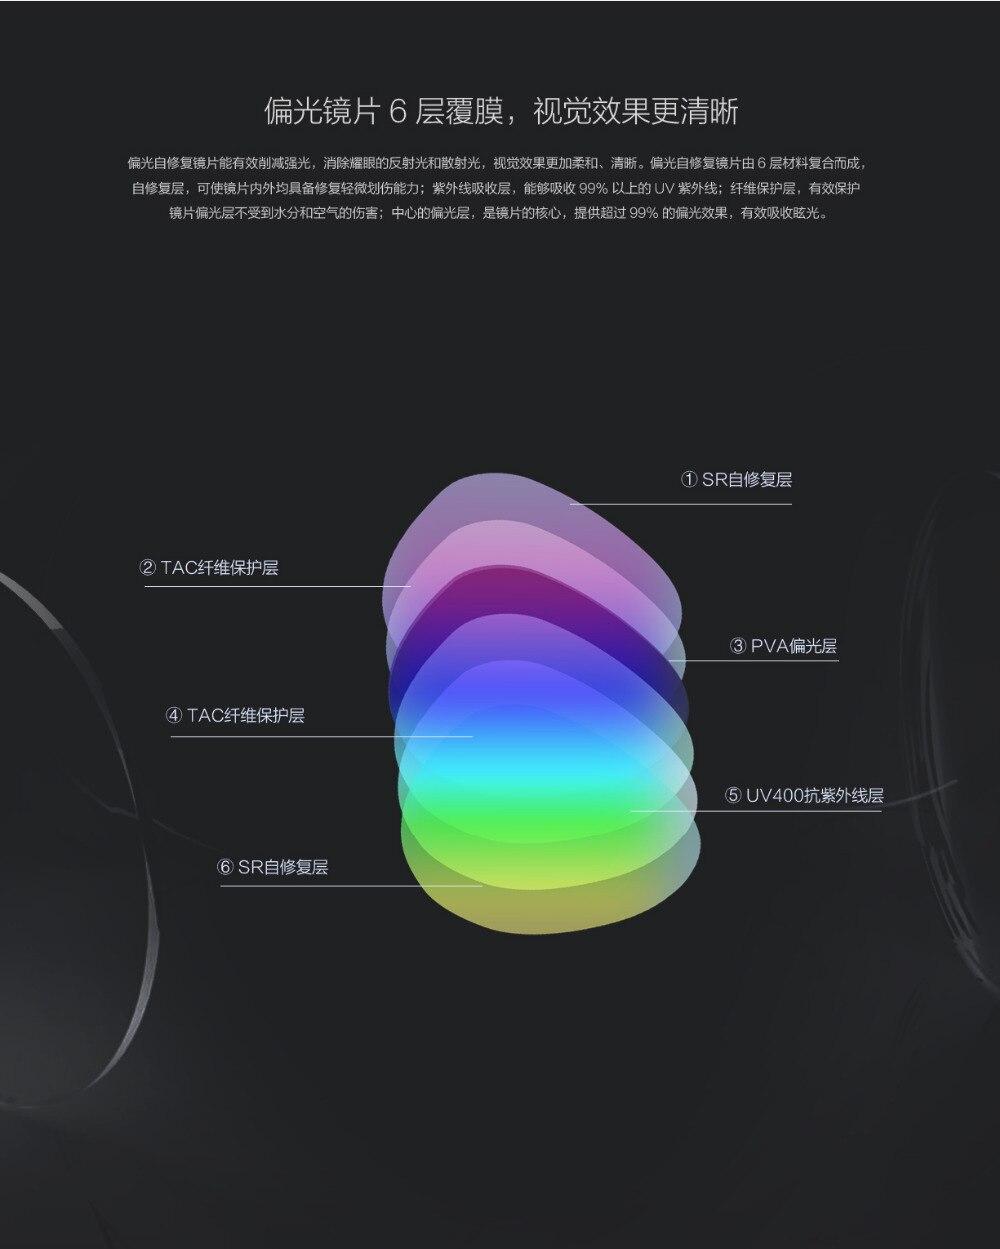 Xiaomi Mijia Turok Steinhardt TS Driver SunglassesTS Nylon Polarized Stainless SunGlass UV400 for Travel Driving unisex H20 (16)